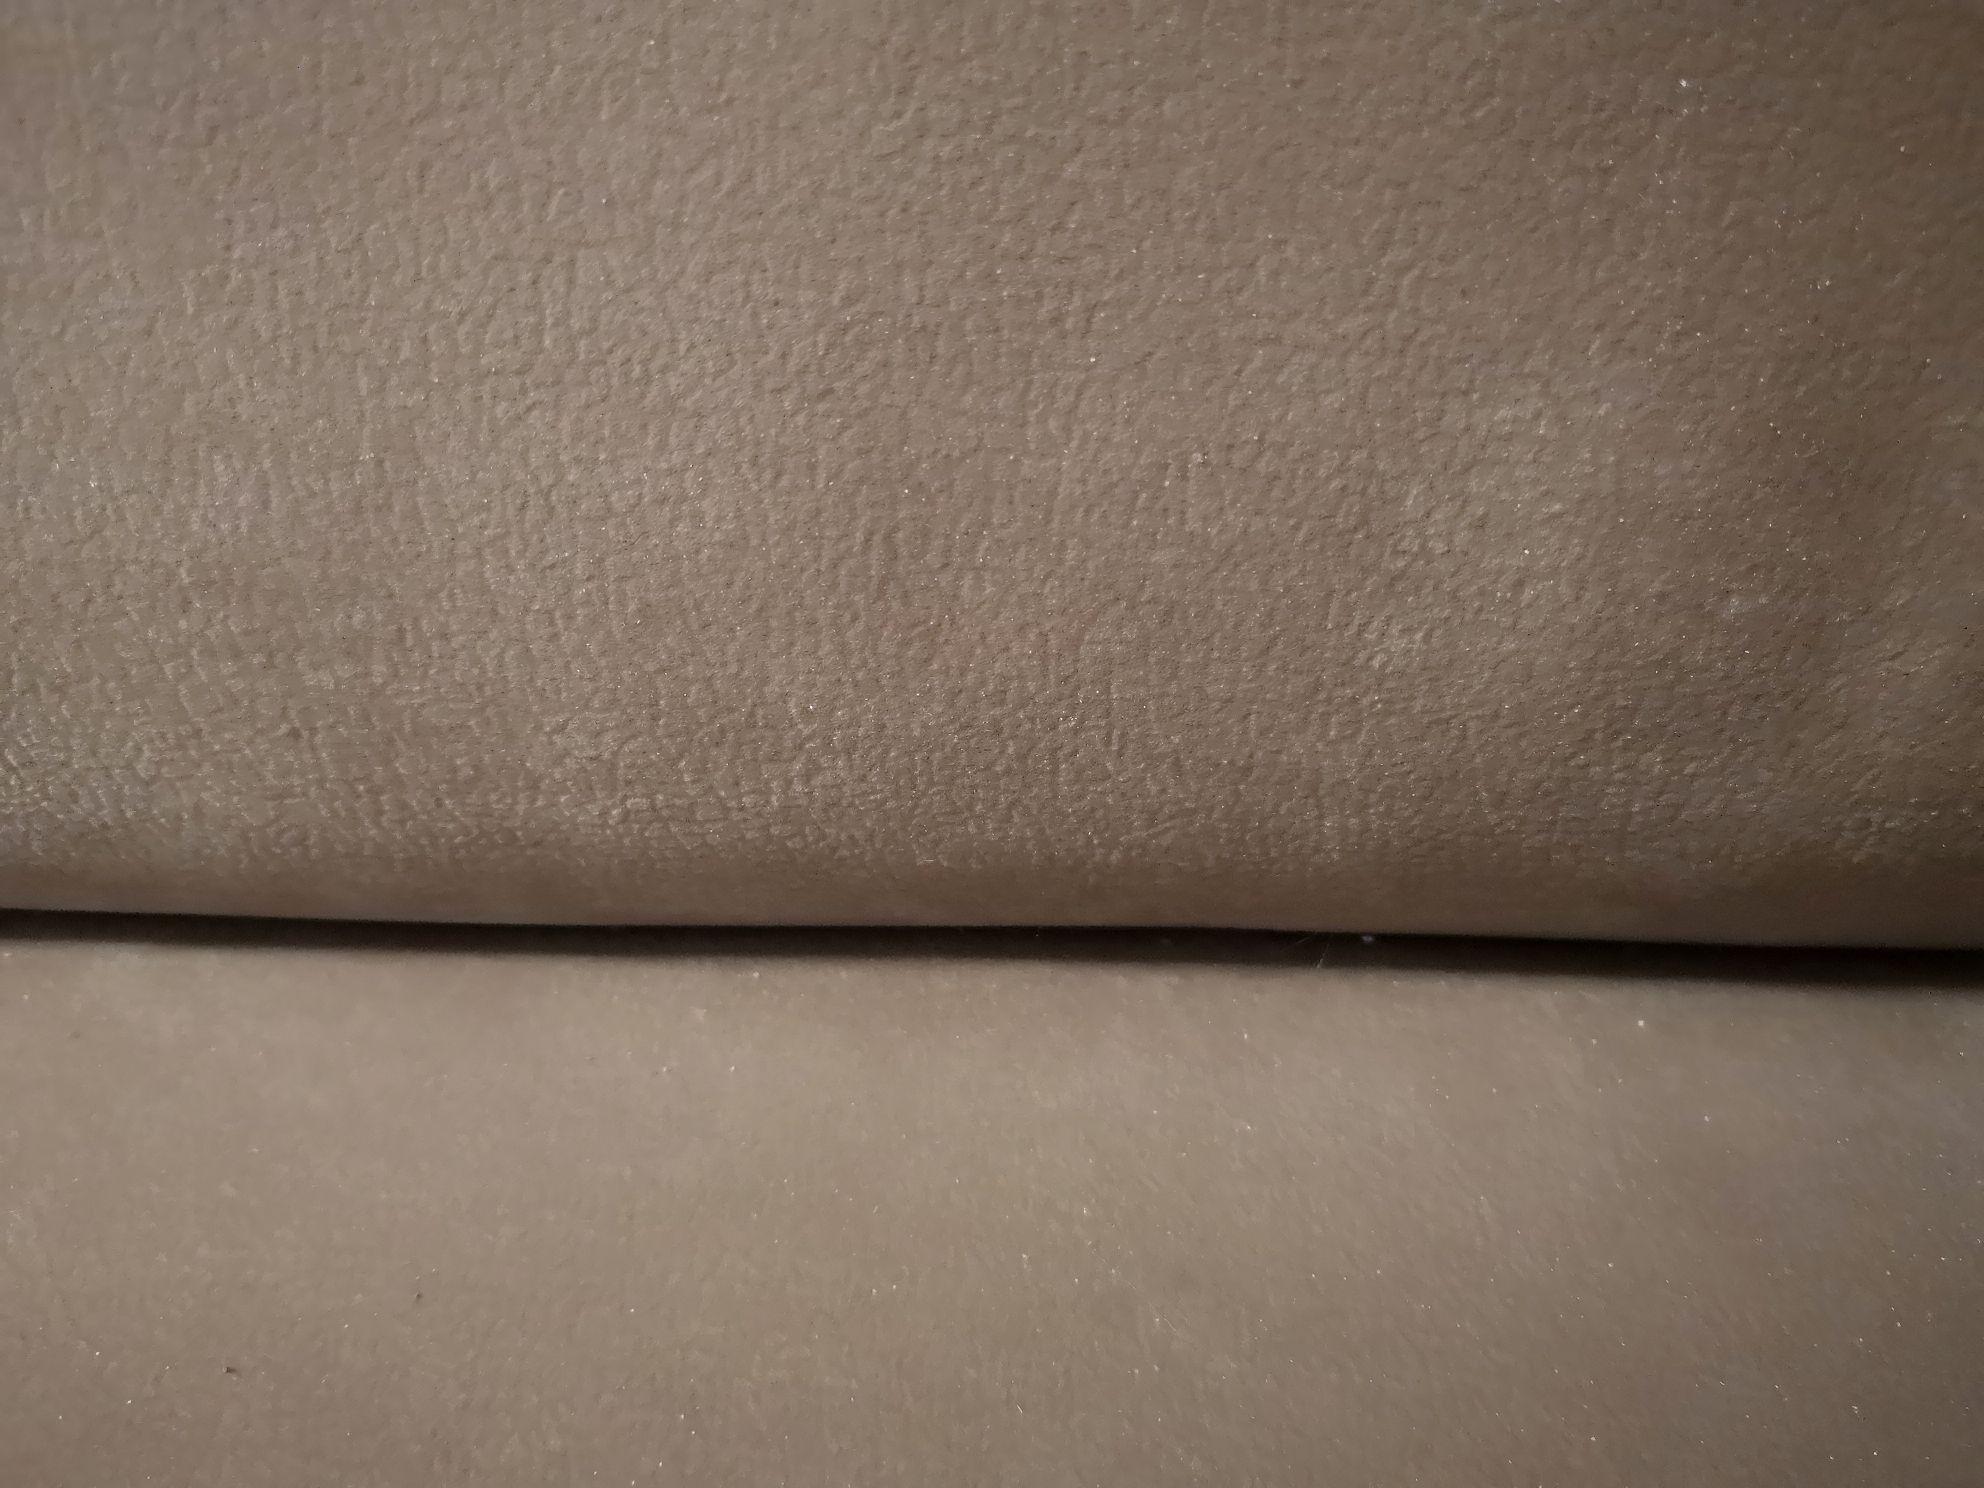 Full Size of Alcantara Sofa Onlineshop Hochwertiges 3 Sitzer 2 5 Big Braun Grau Brühl Spannbezug Reinigen Leder Gelb Modernes Baxter Beziehen Dauerschläfer Ecksofa Garten Sofa Alcantara Sofa